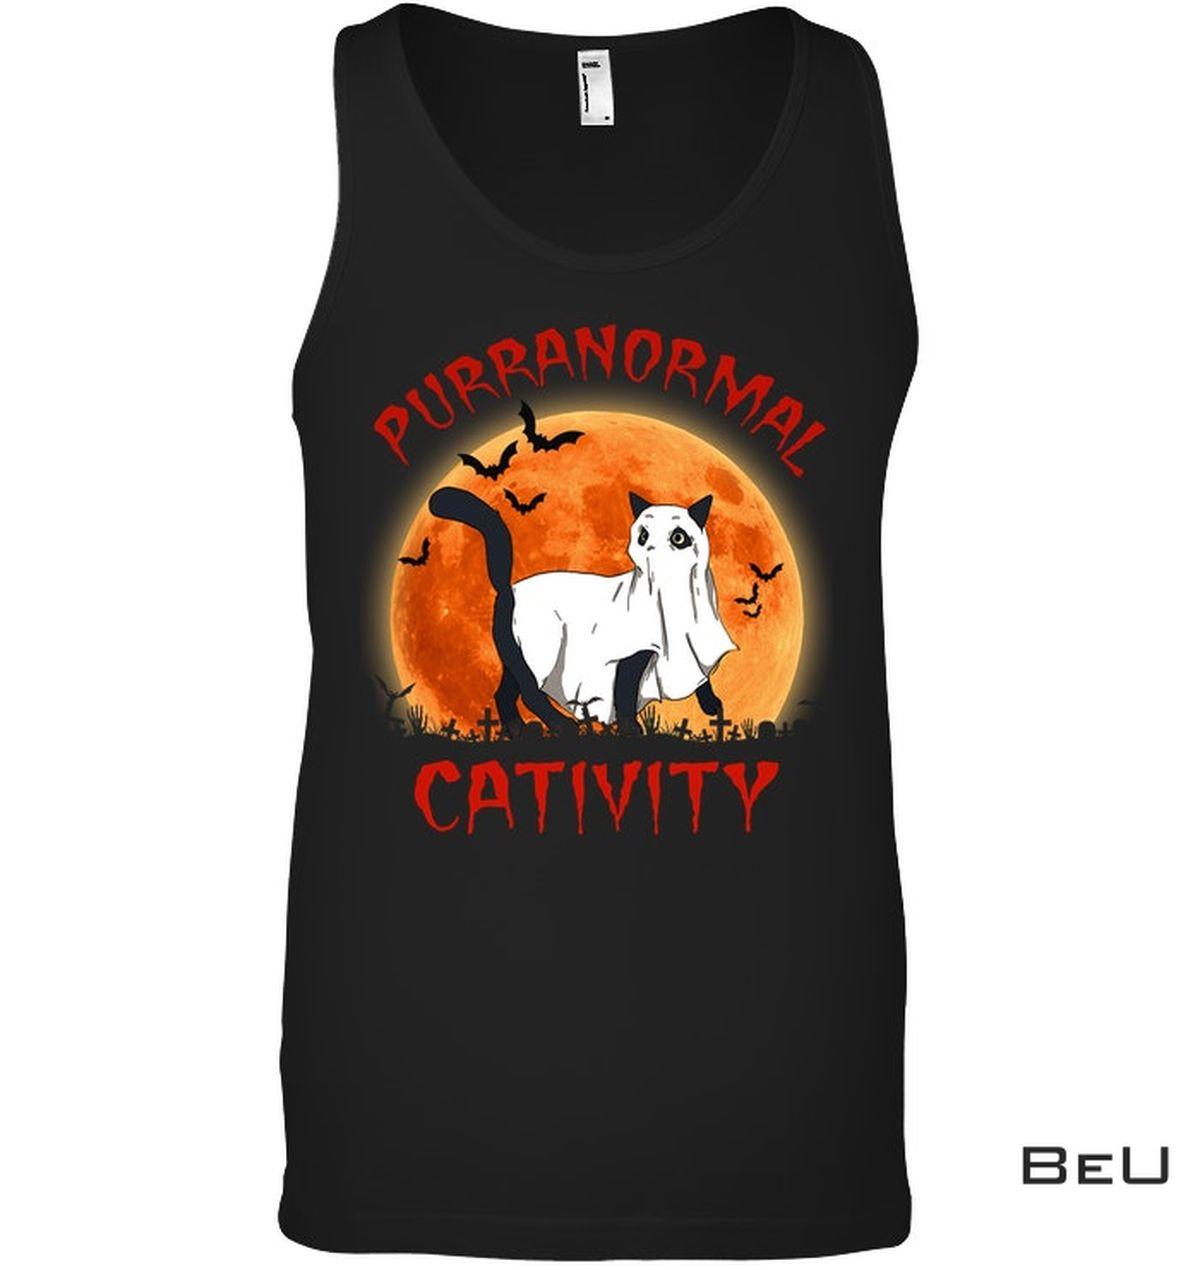 3D Halloween Cat Purranormal Cativity Shirt, hoodie, tank top